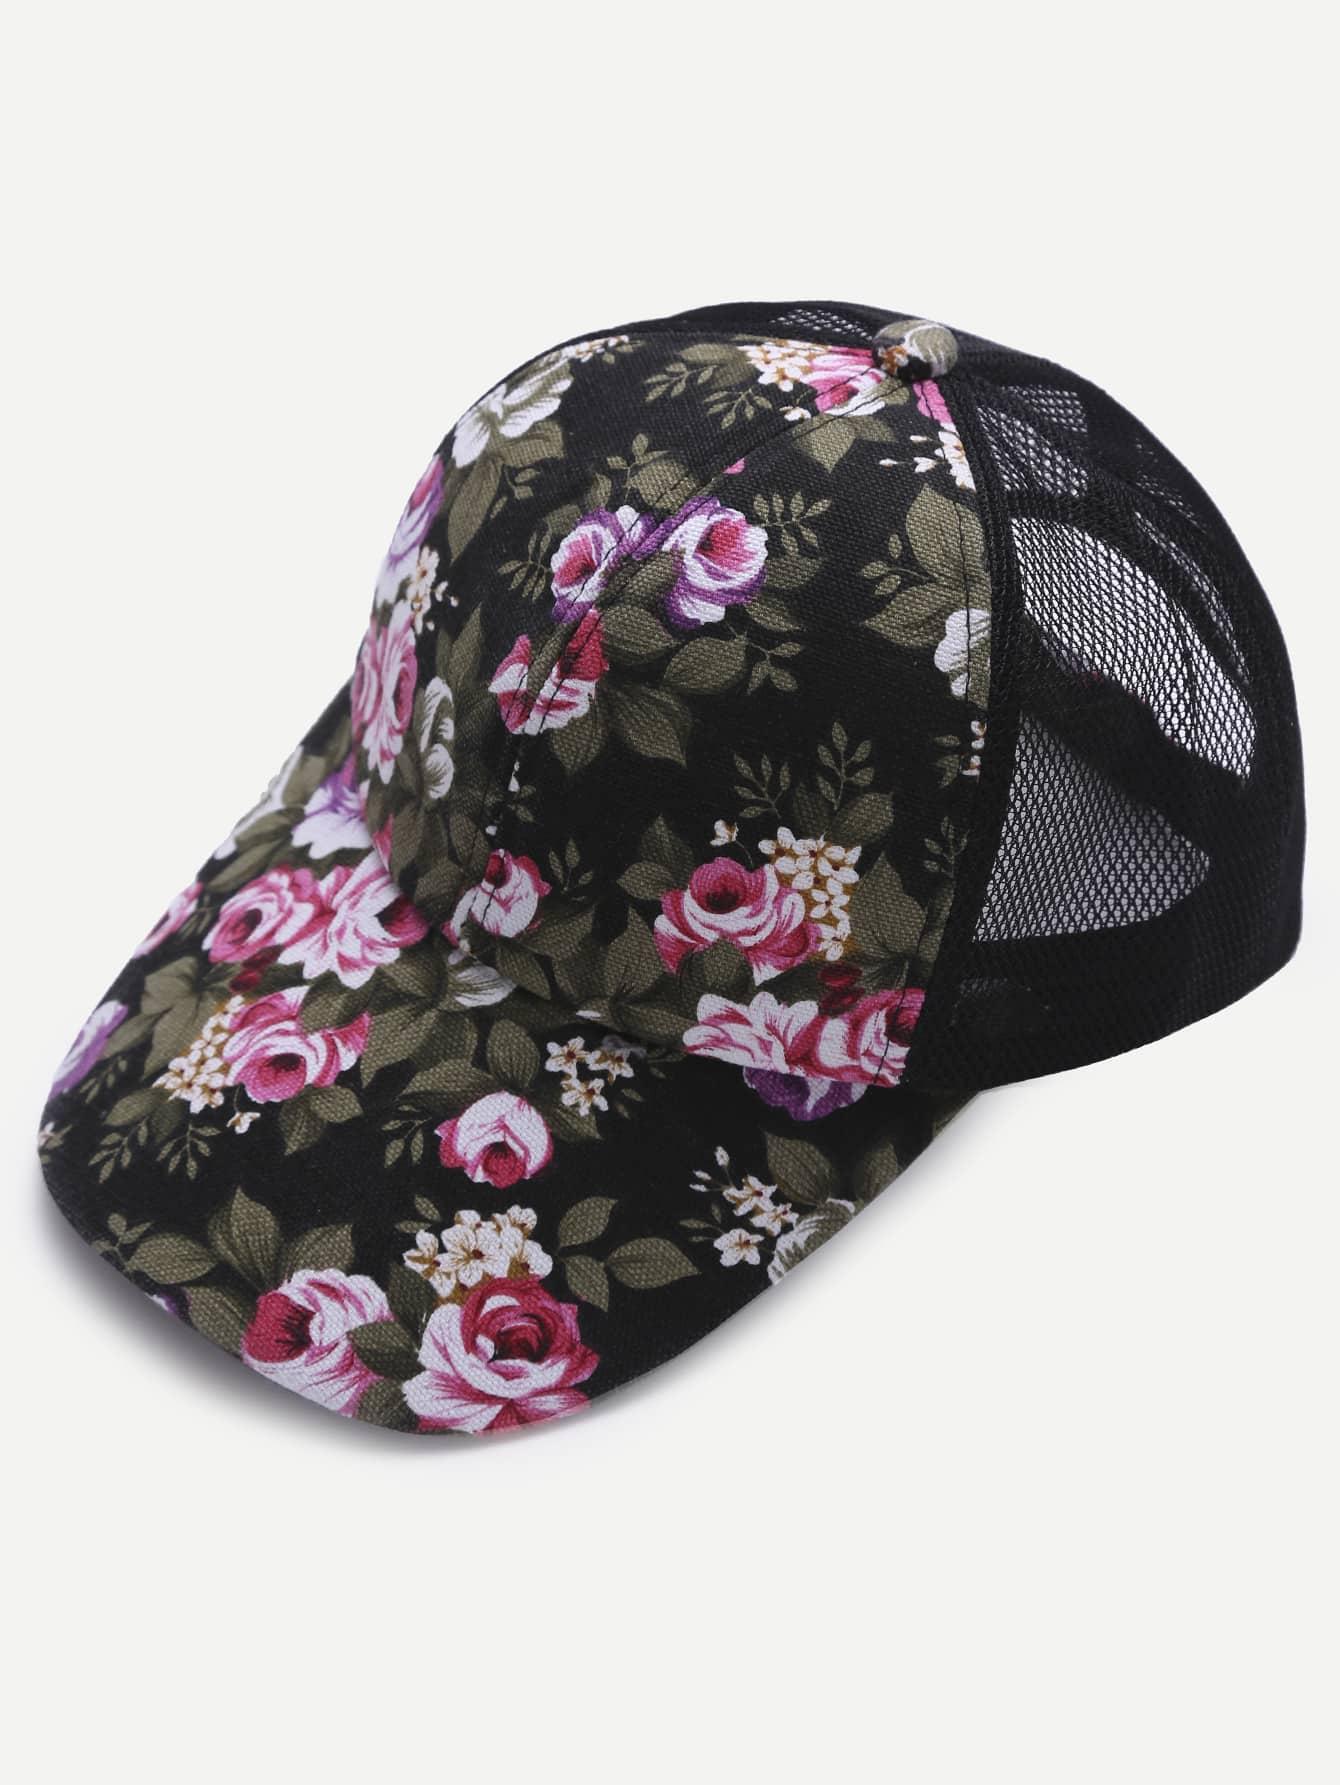 Фото Floral Print Front Black Mesh Snapback Baseball Cap. Купить с доставкой